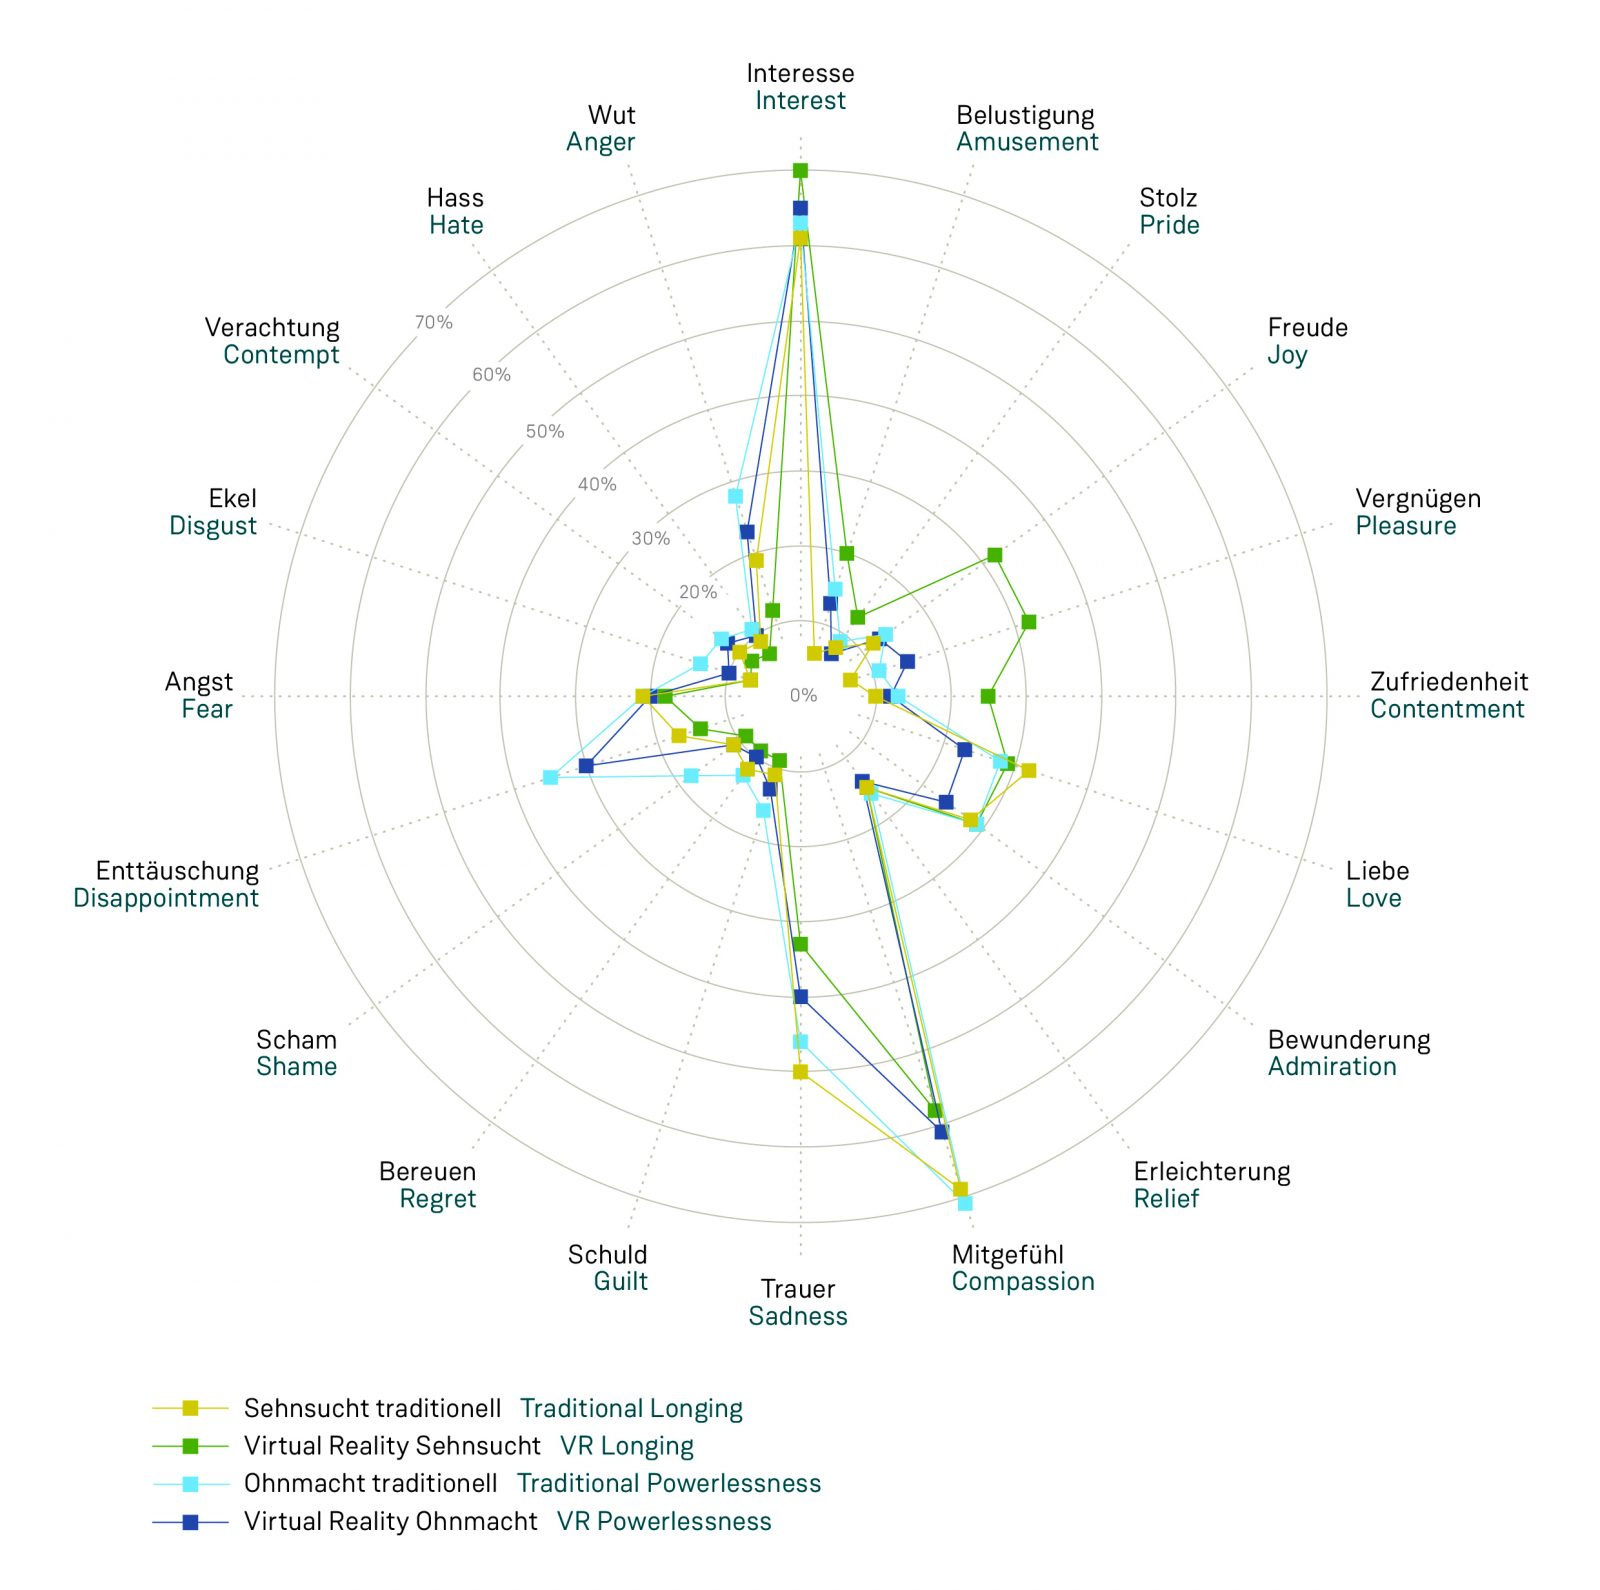 Grafische Datenauswertung